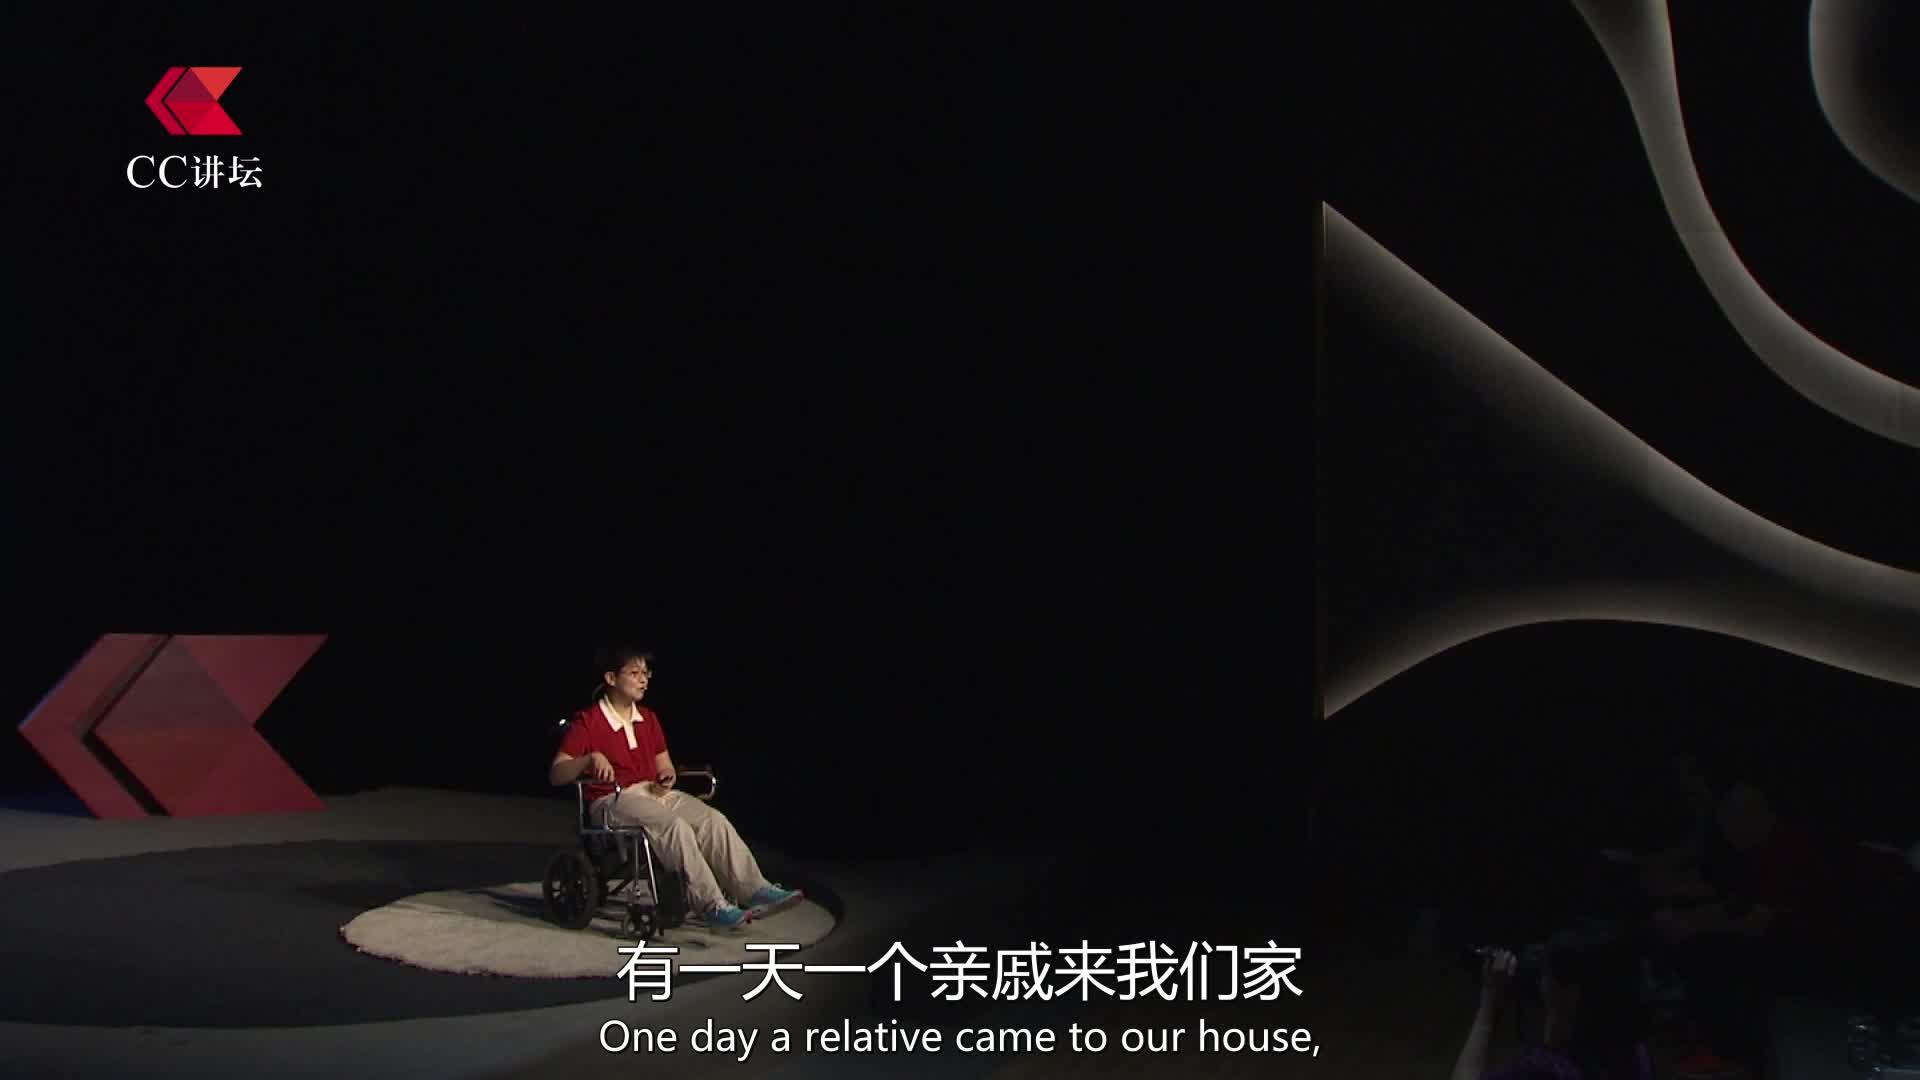 CC讲坛——刘彤:我是你的眼睛